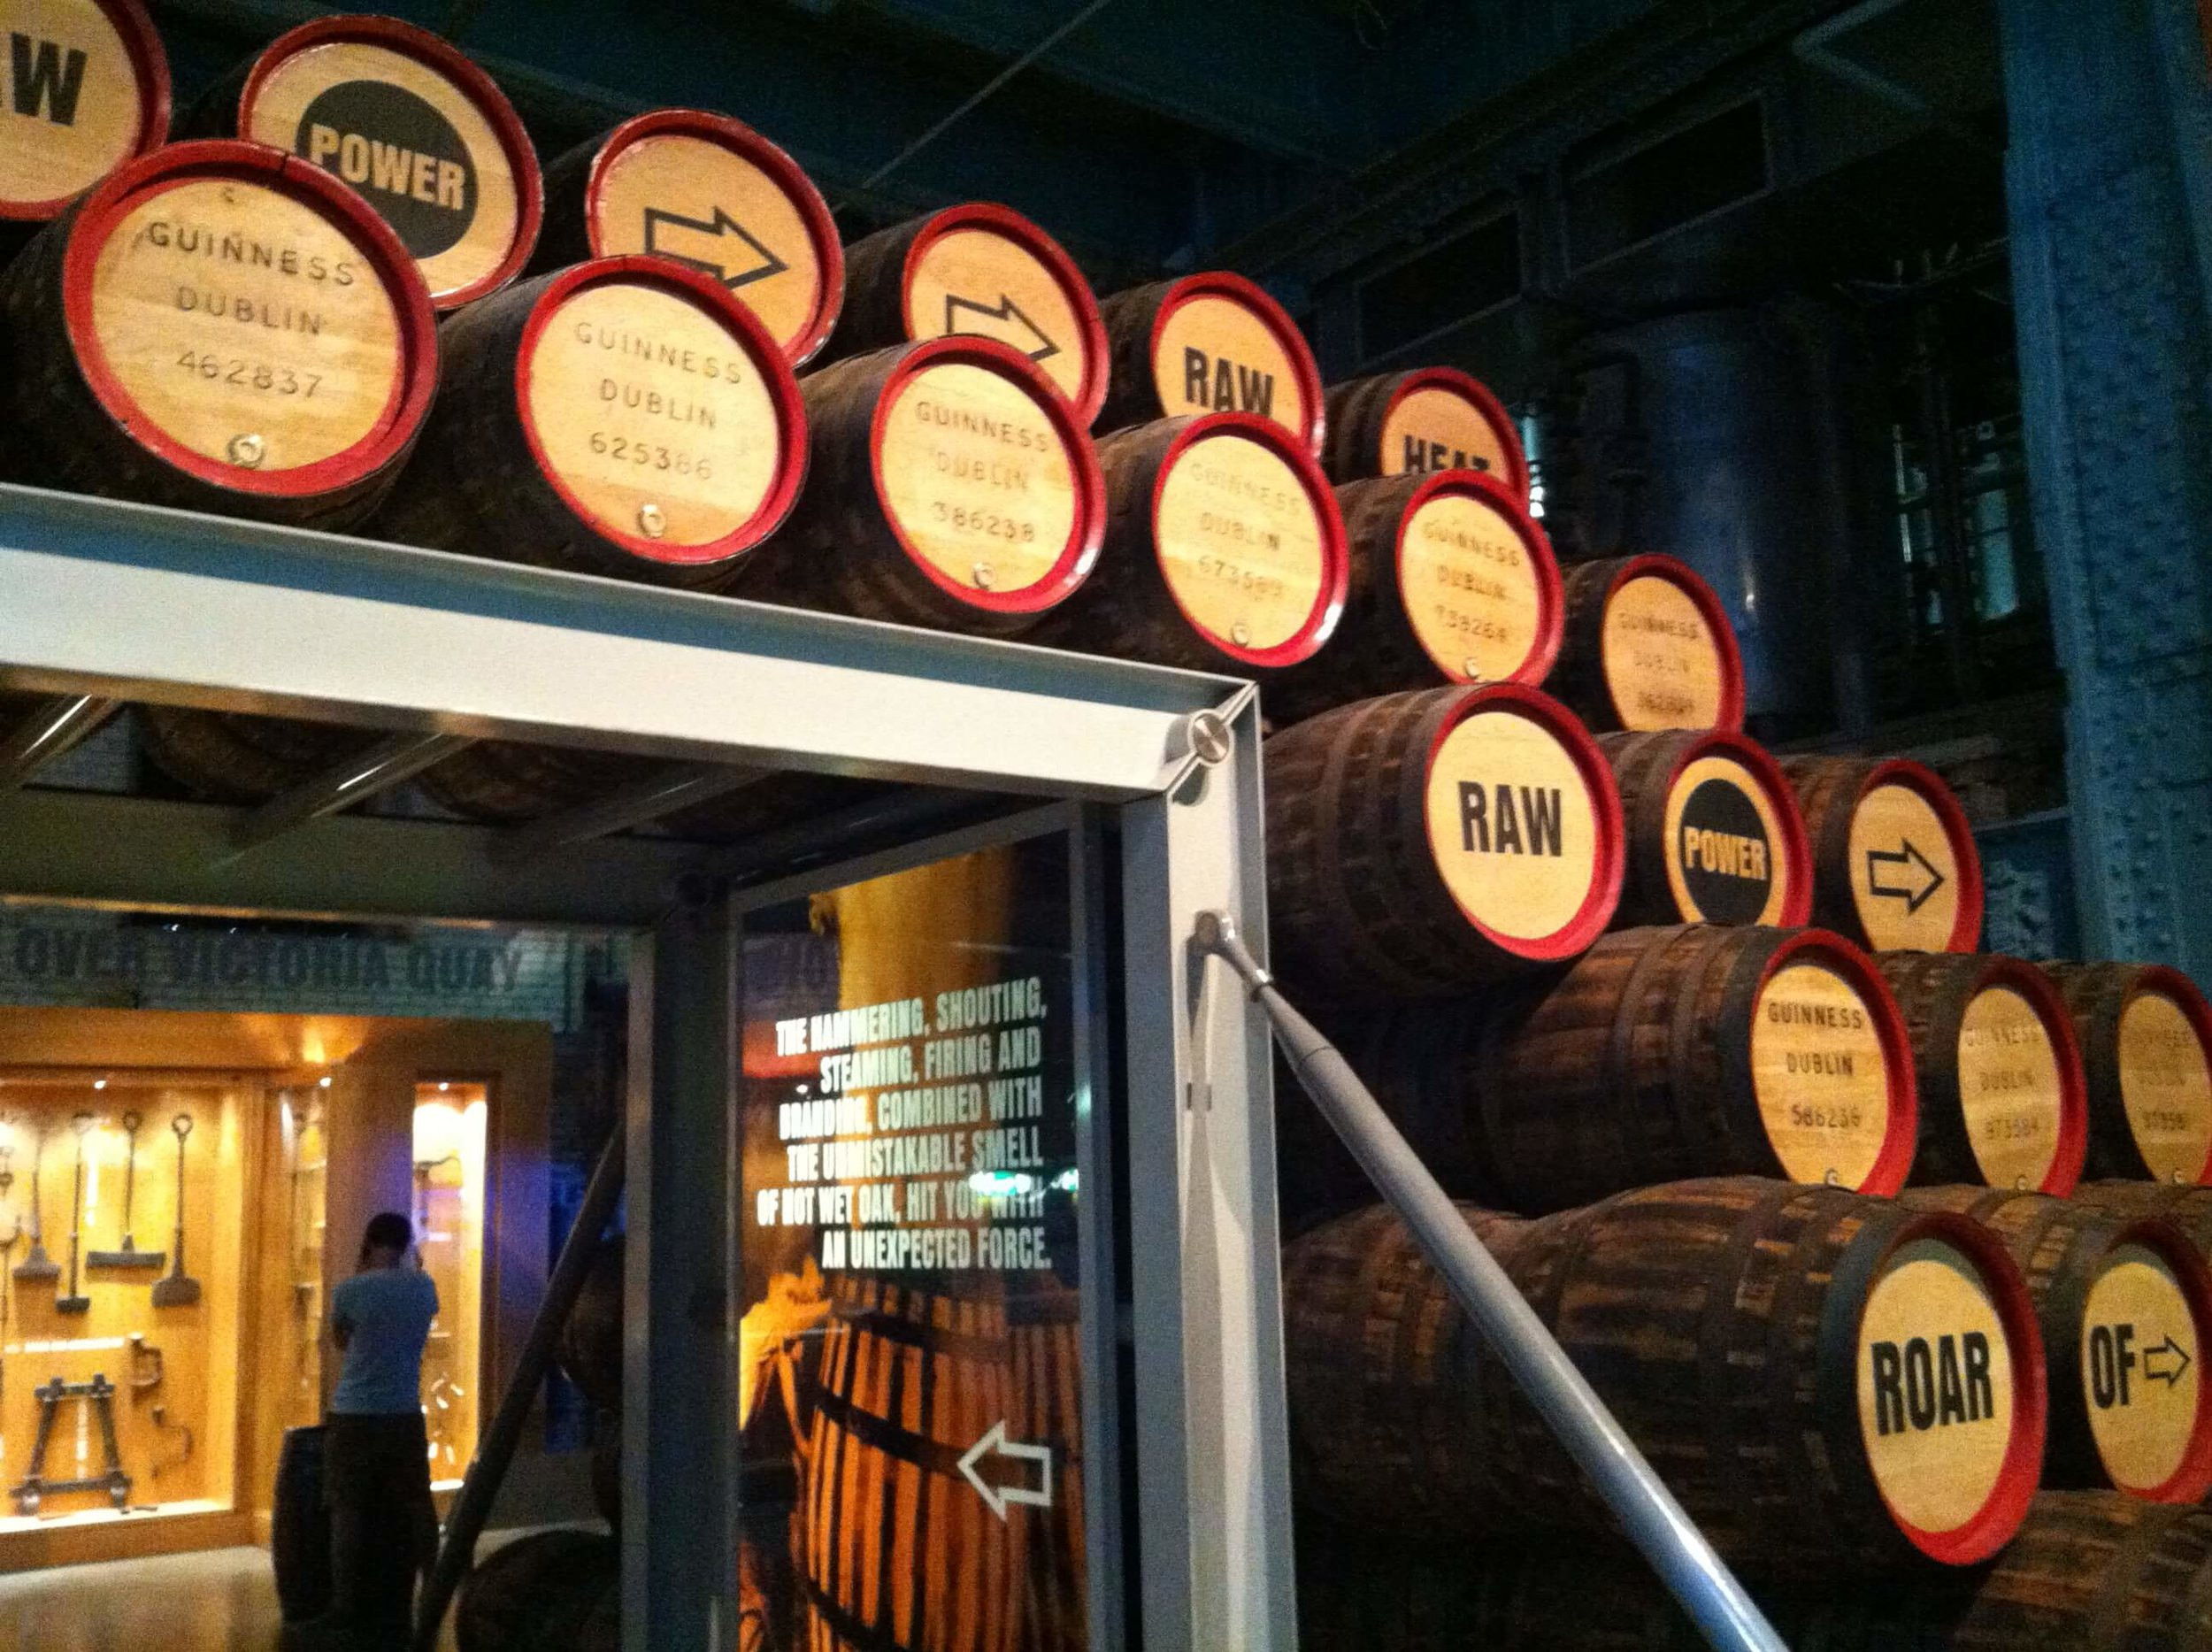 Guinness Brewery Storehouse Tour in Dublin, Ireland